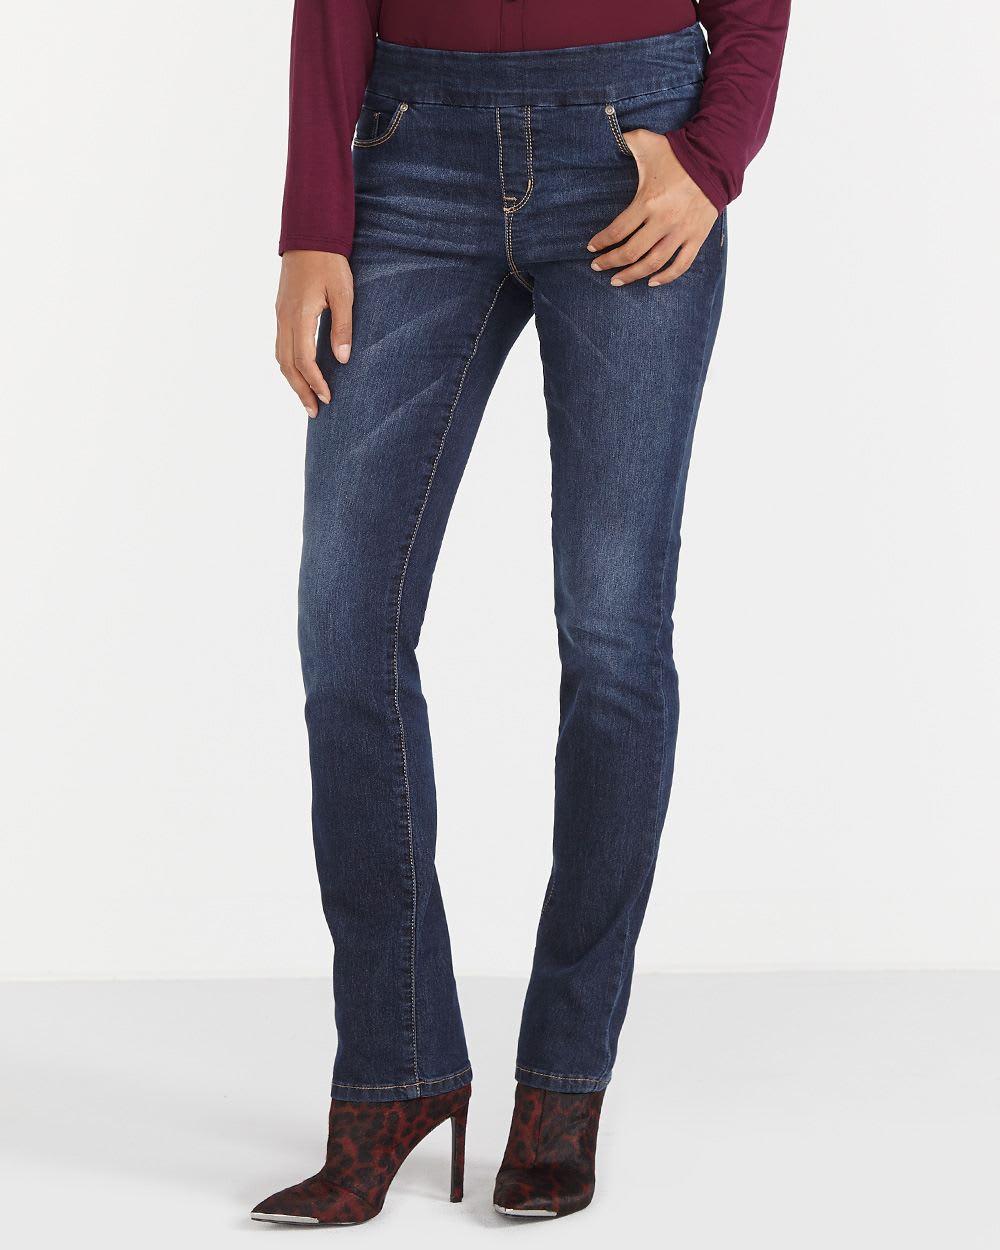 Ultra Petite Original Comfort Straight Leg Jeans